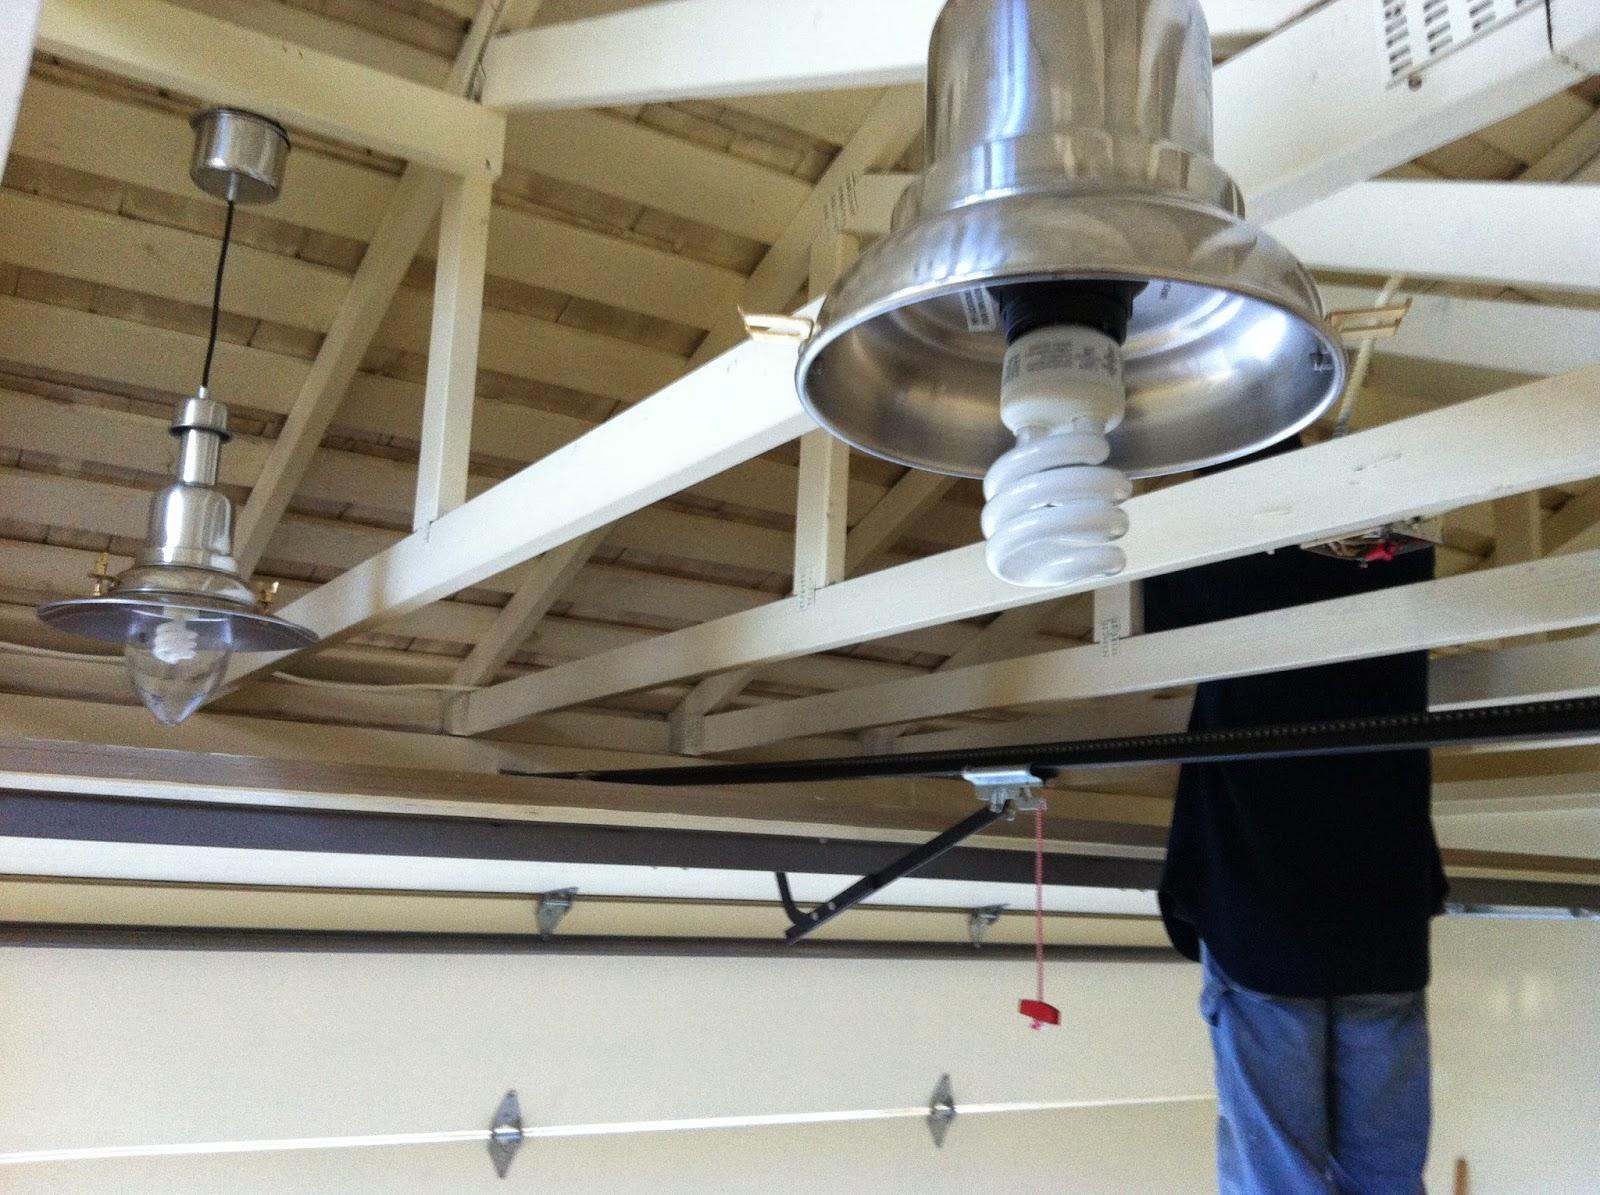 Diy Dithering Lighting Up The Garage